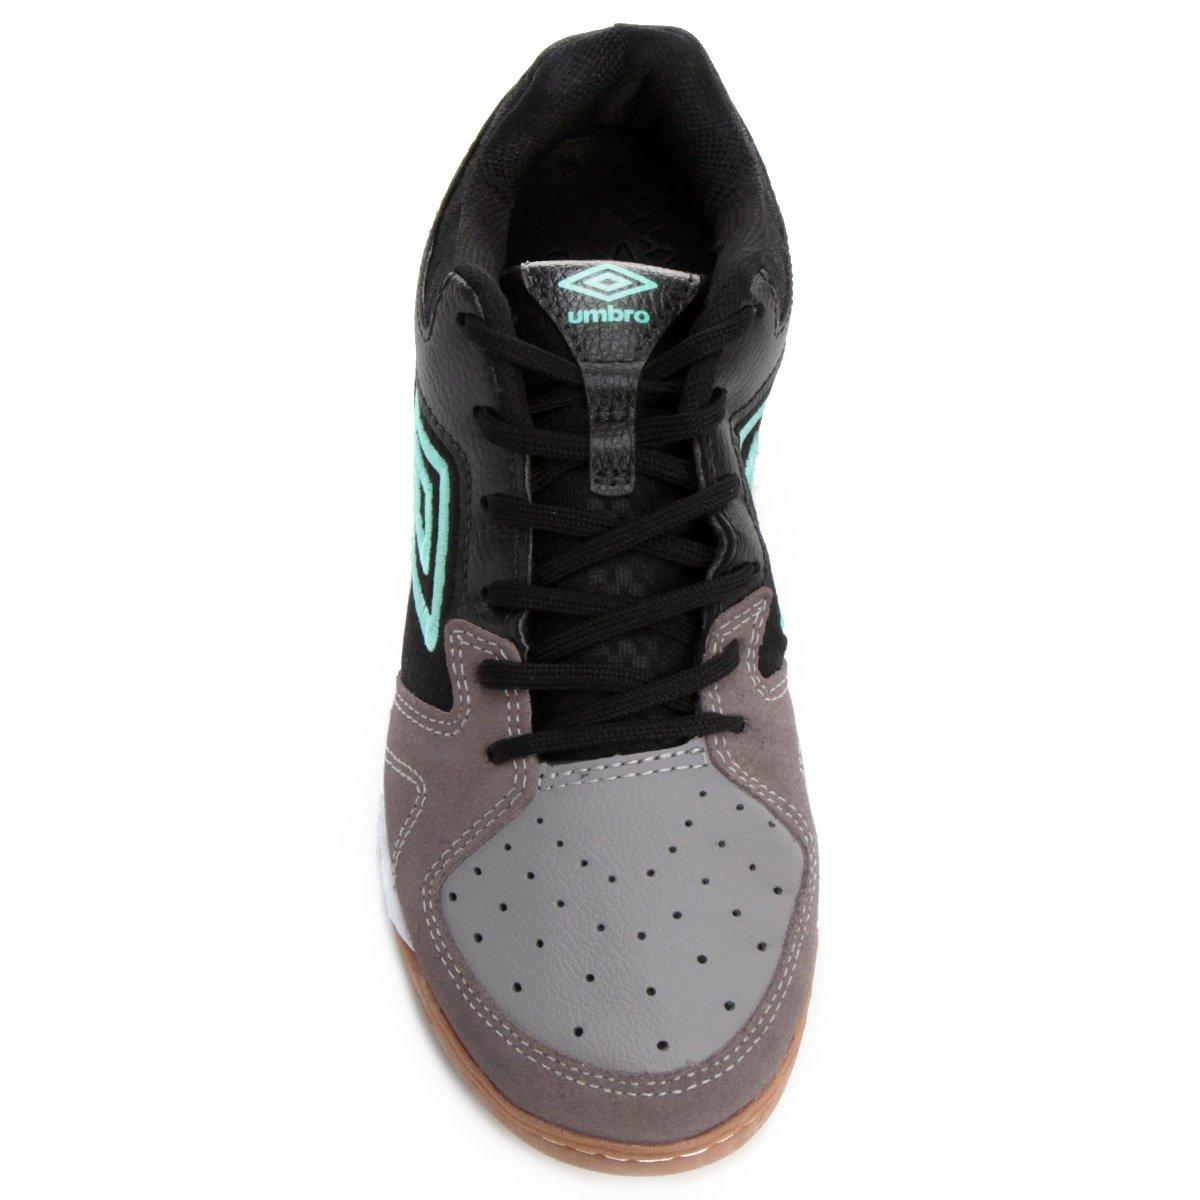 07a5ad86db Chuteira Umbro Pro 3 Futsal - Compre Agora